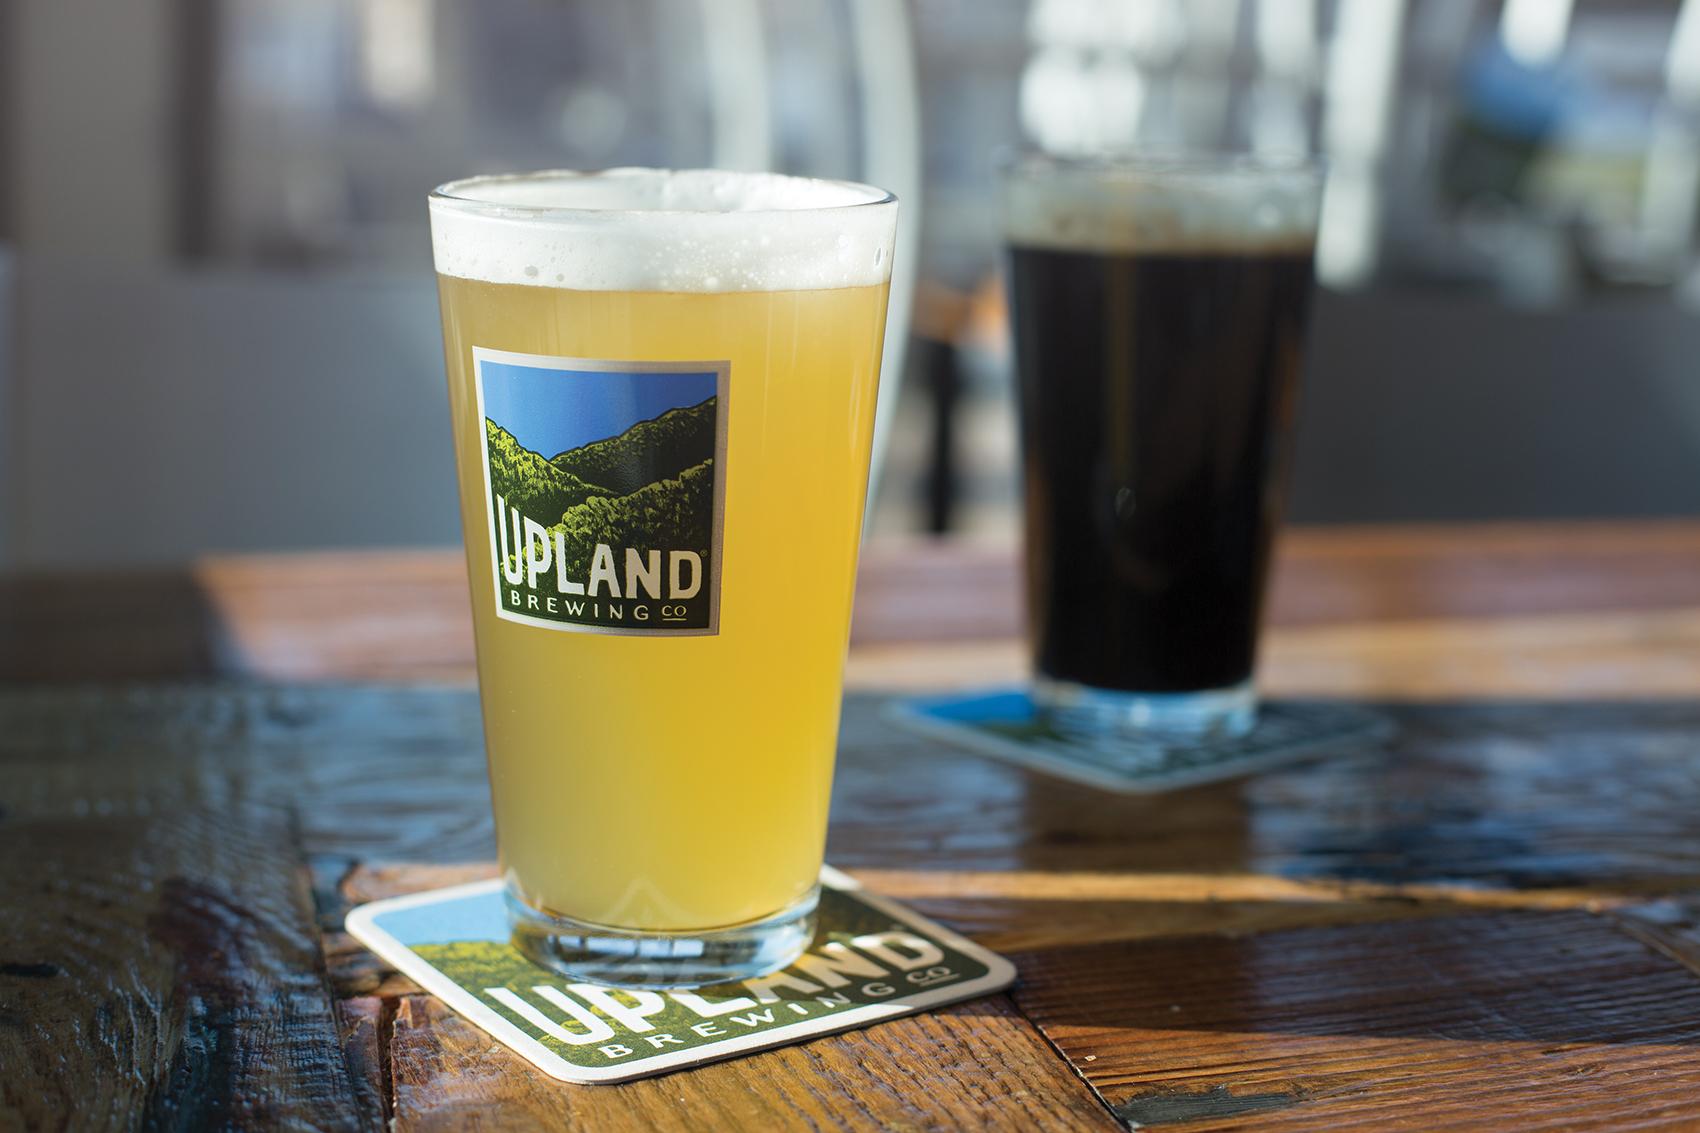 Upland brewing company rebranding branding beer